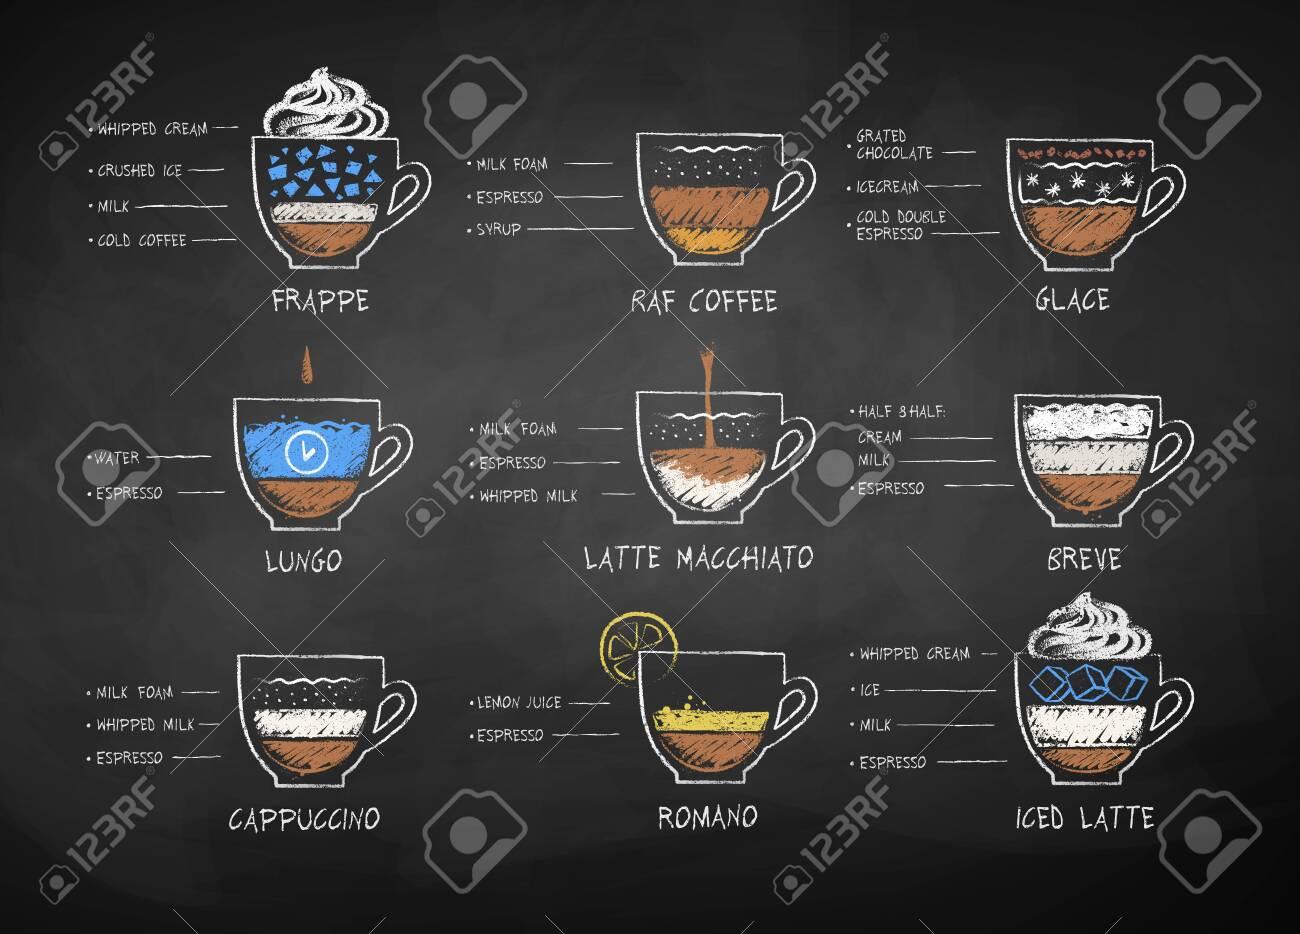 Vector chalk drawn sketch of Iced Mocha coffee recipe on chalkboard background. - 122827118